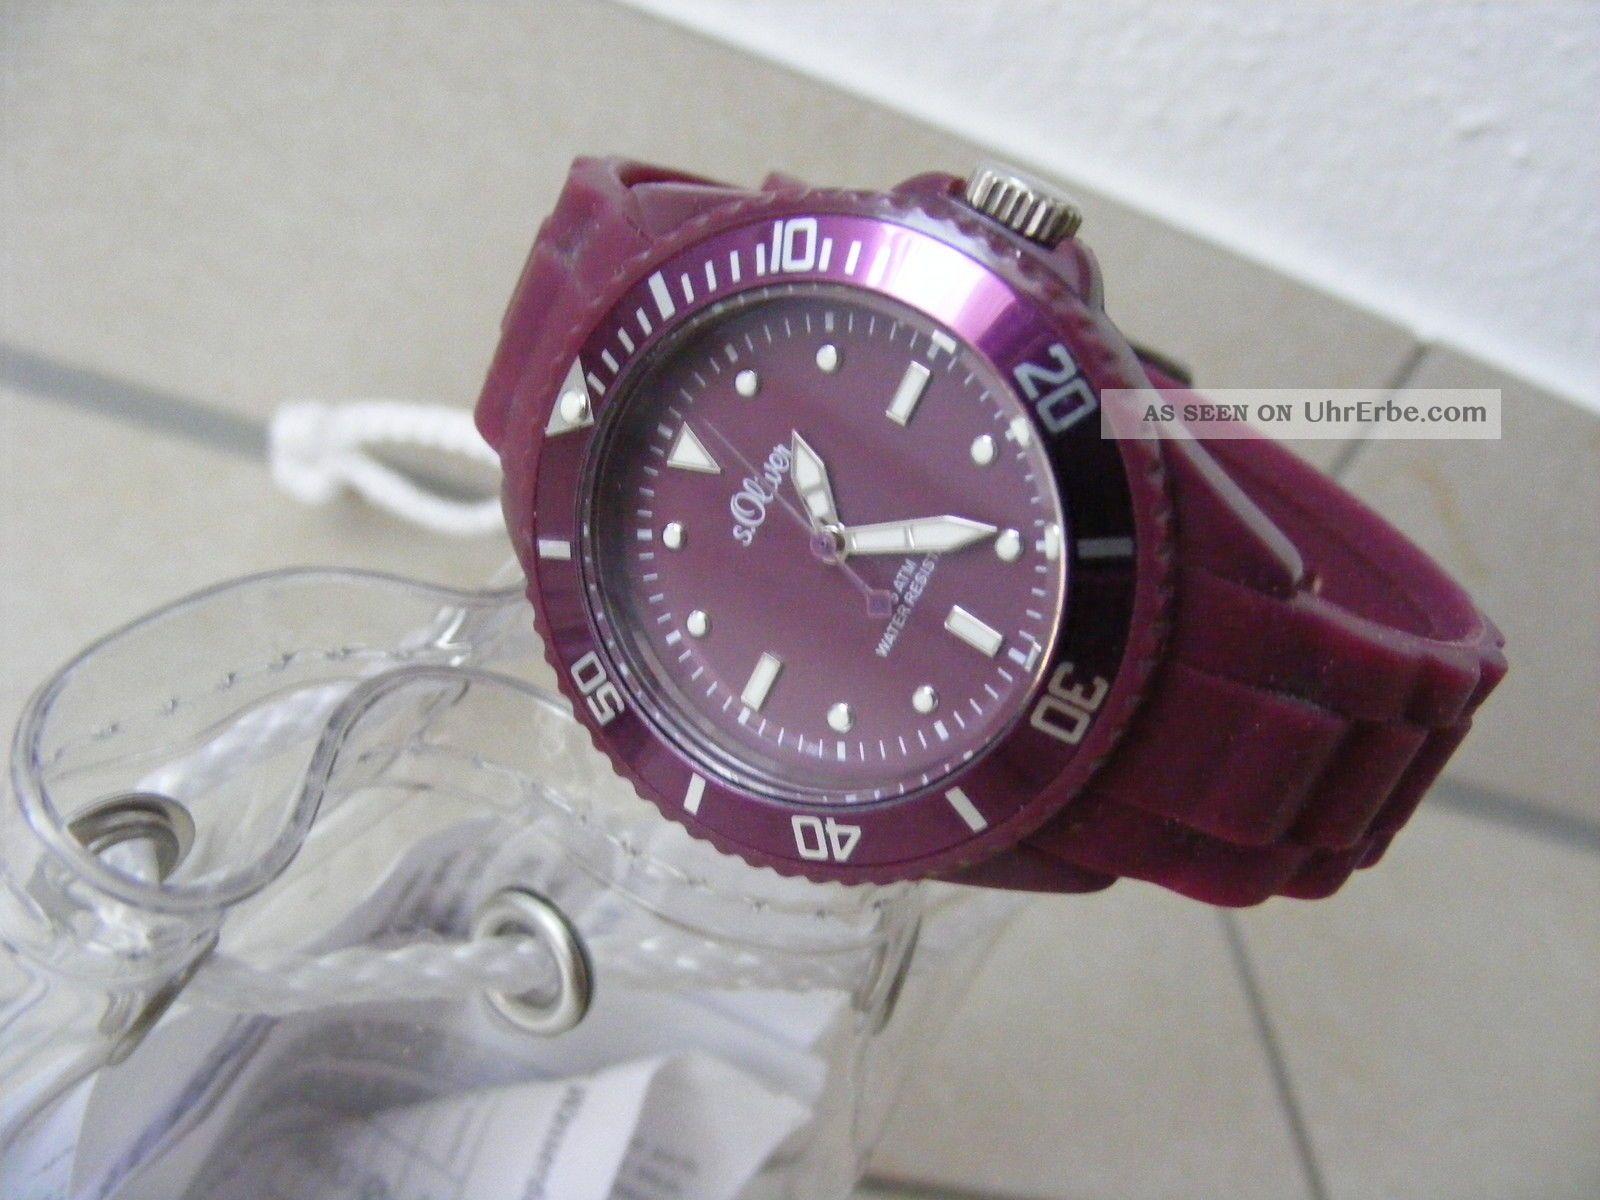 S.  Oliver Armbanduhr - Lila/violett - Mit Silikonarmband - Neuwertig - Damen Armbanduhren Bild